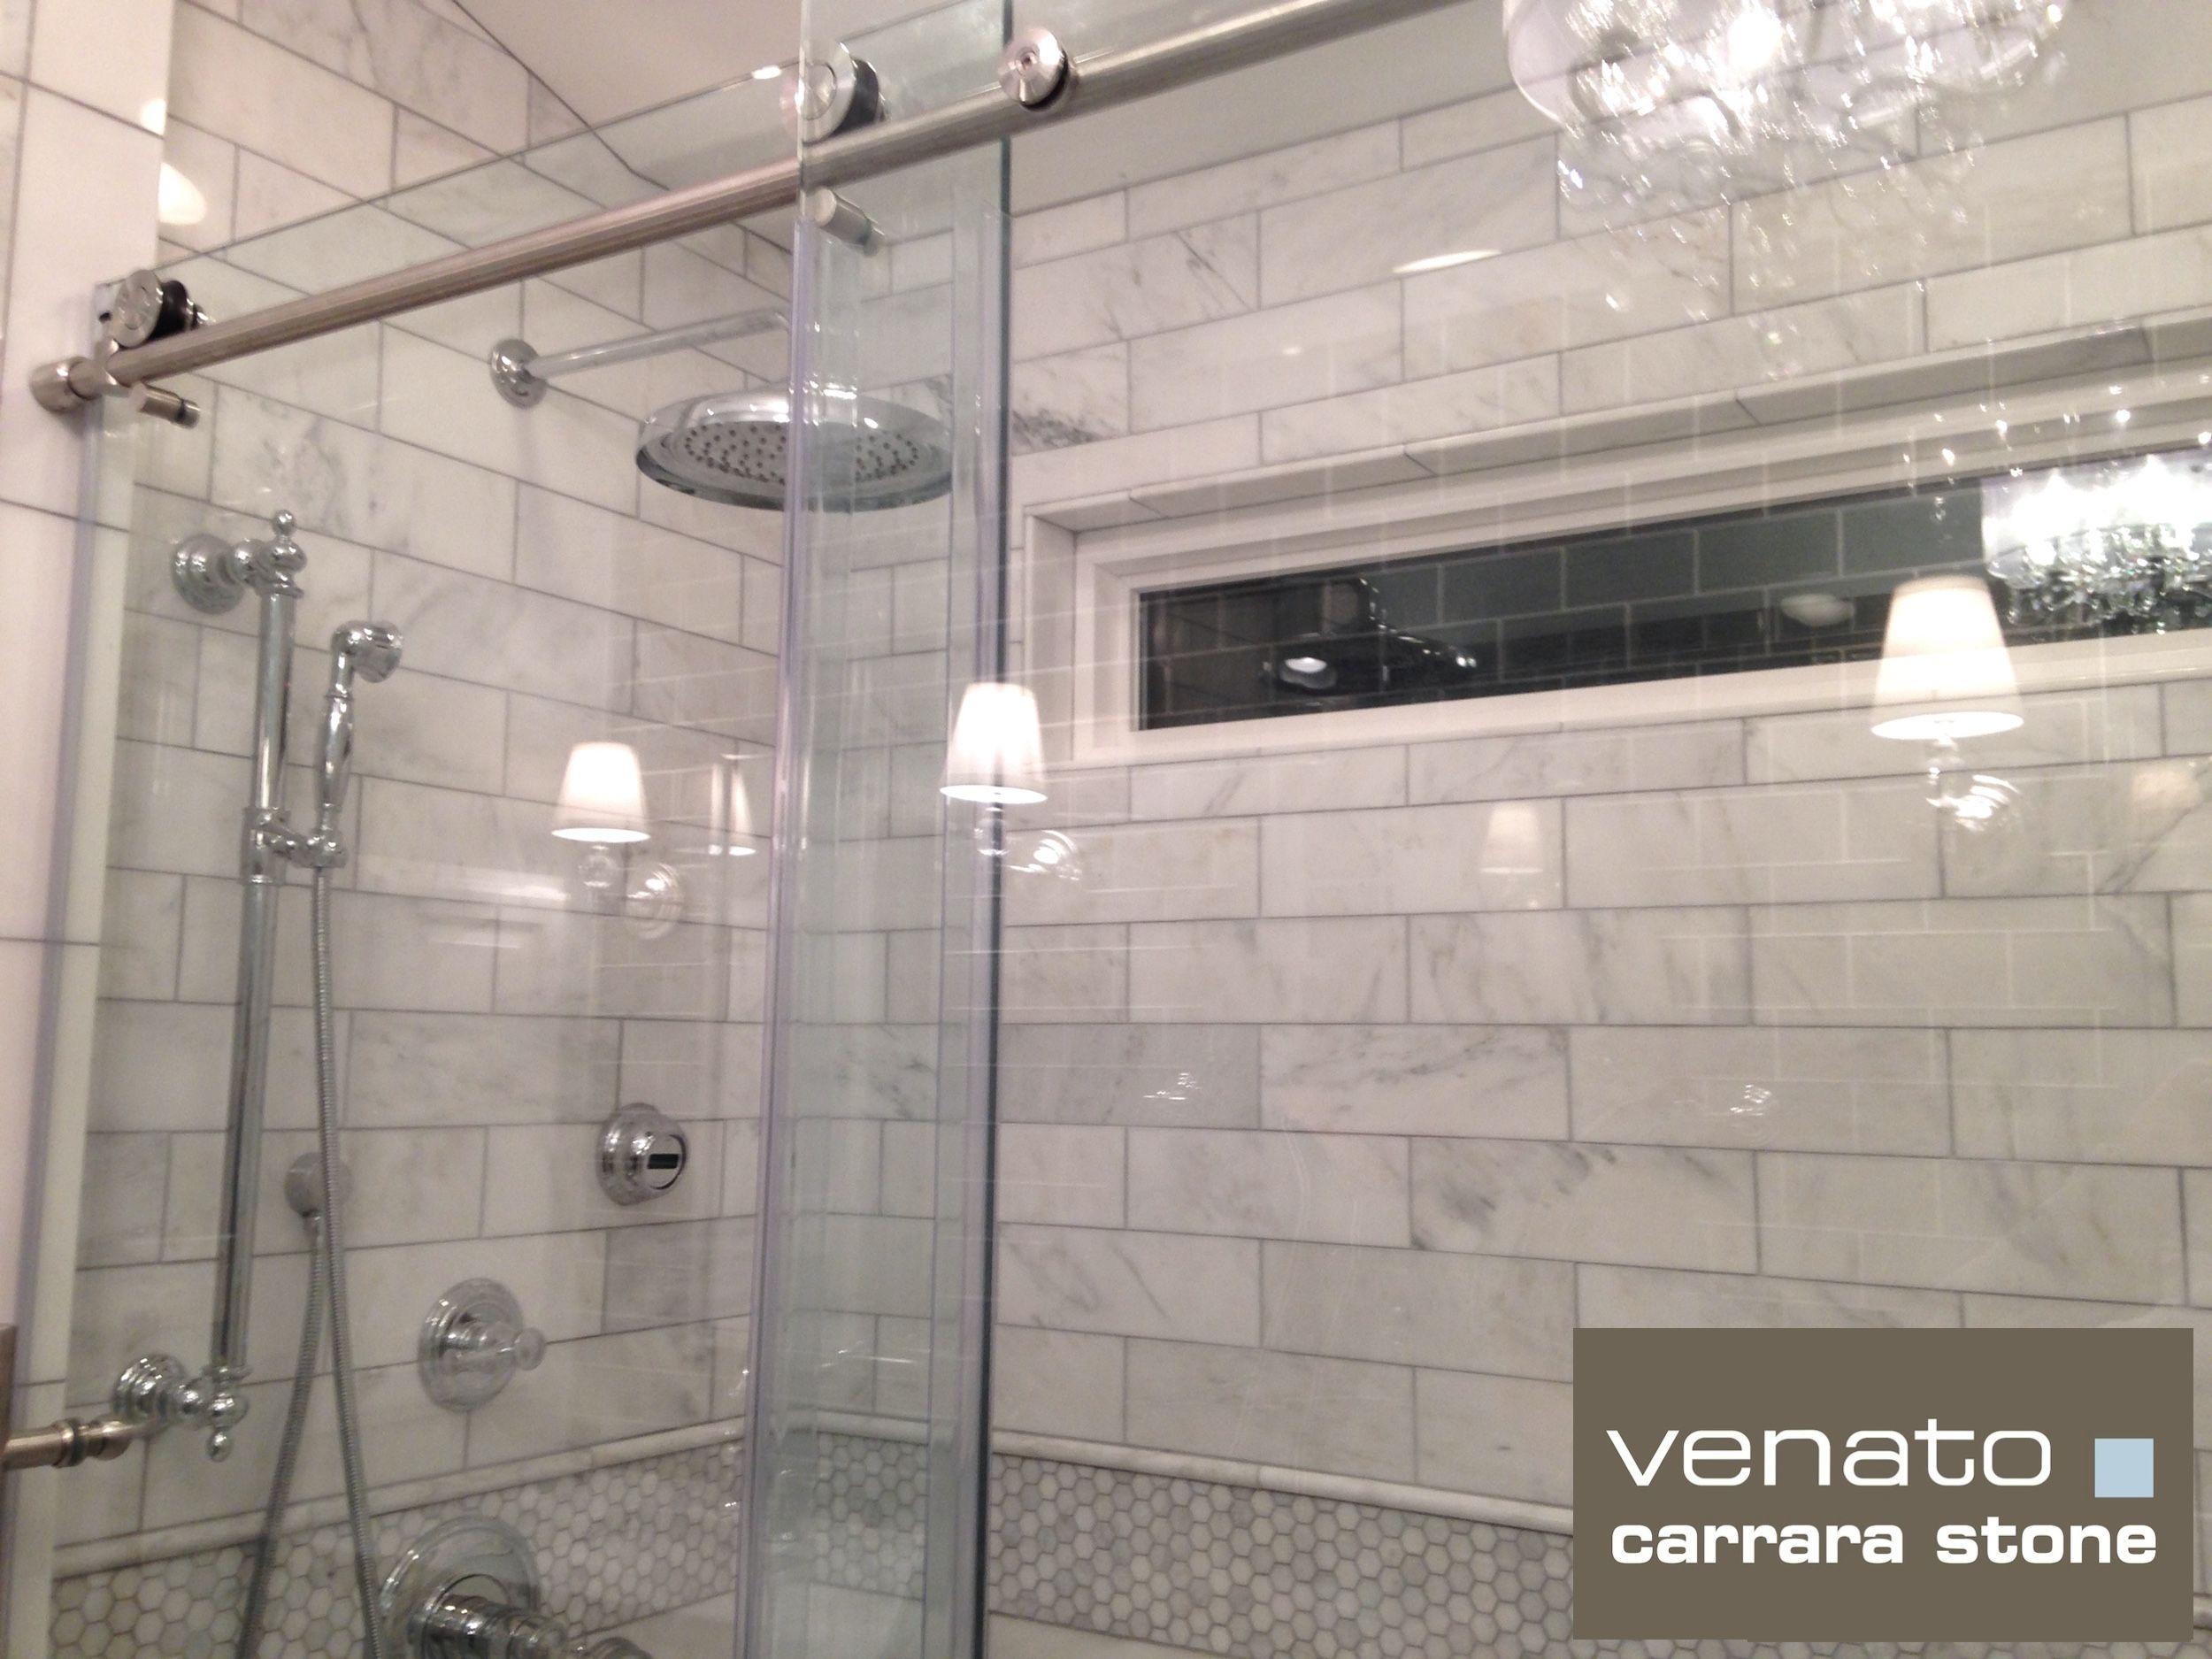 4x12 Subway Tile Shower Google Search Carrara Tile Shower